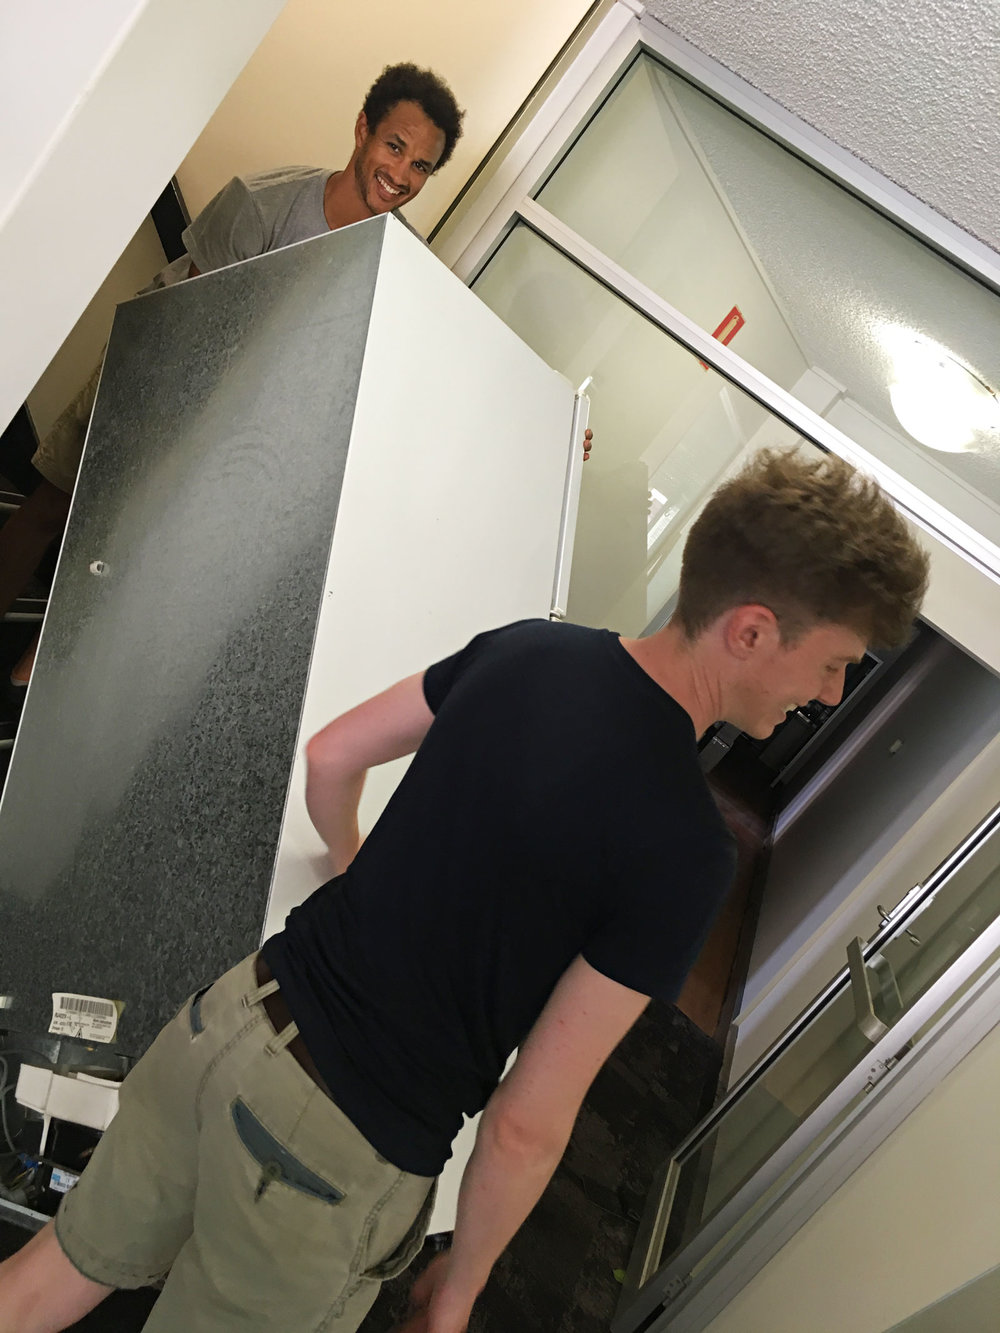 fridgeblog.jpg